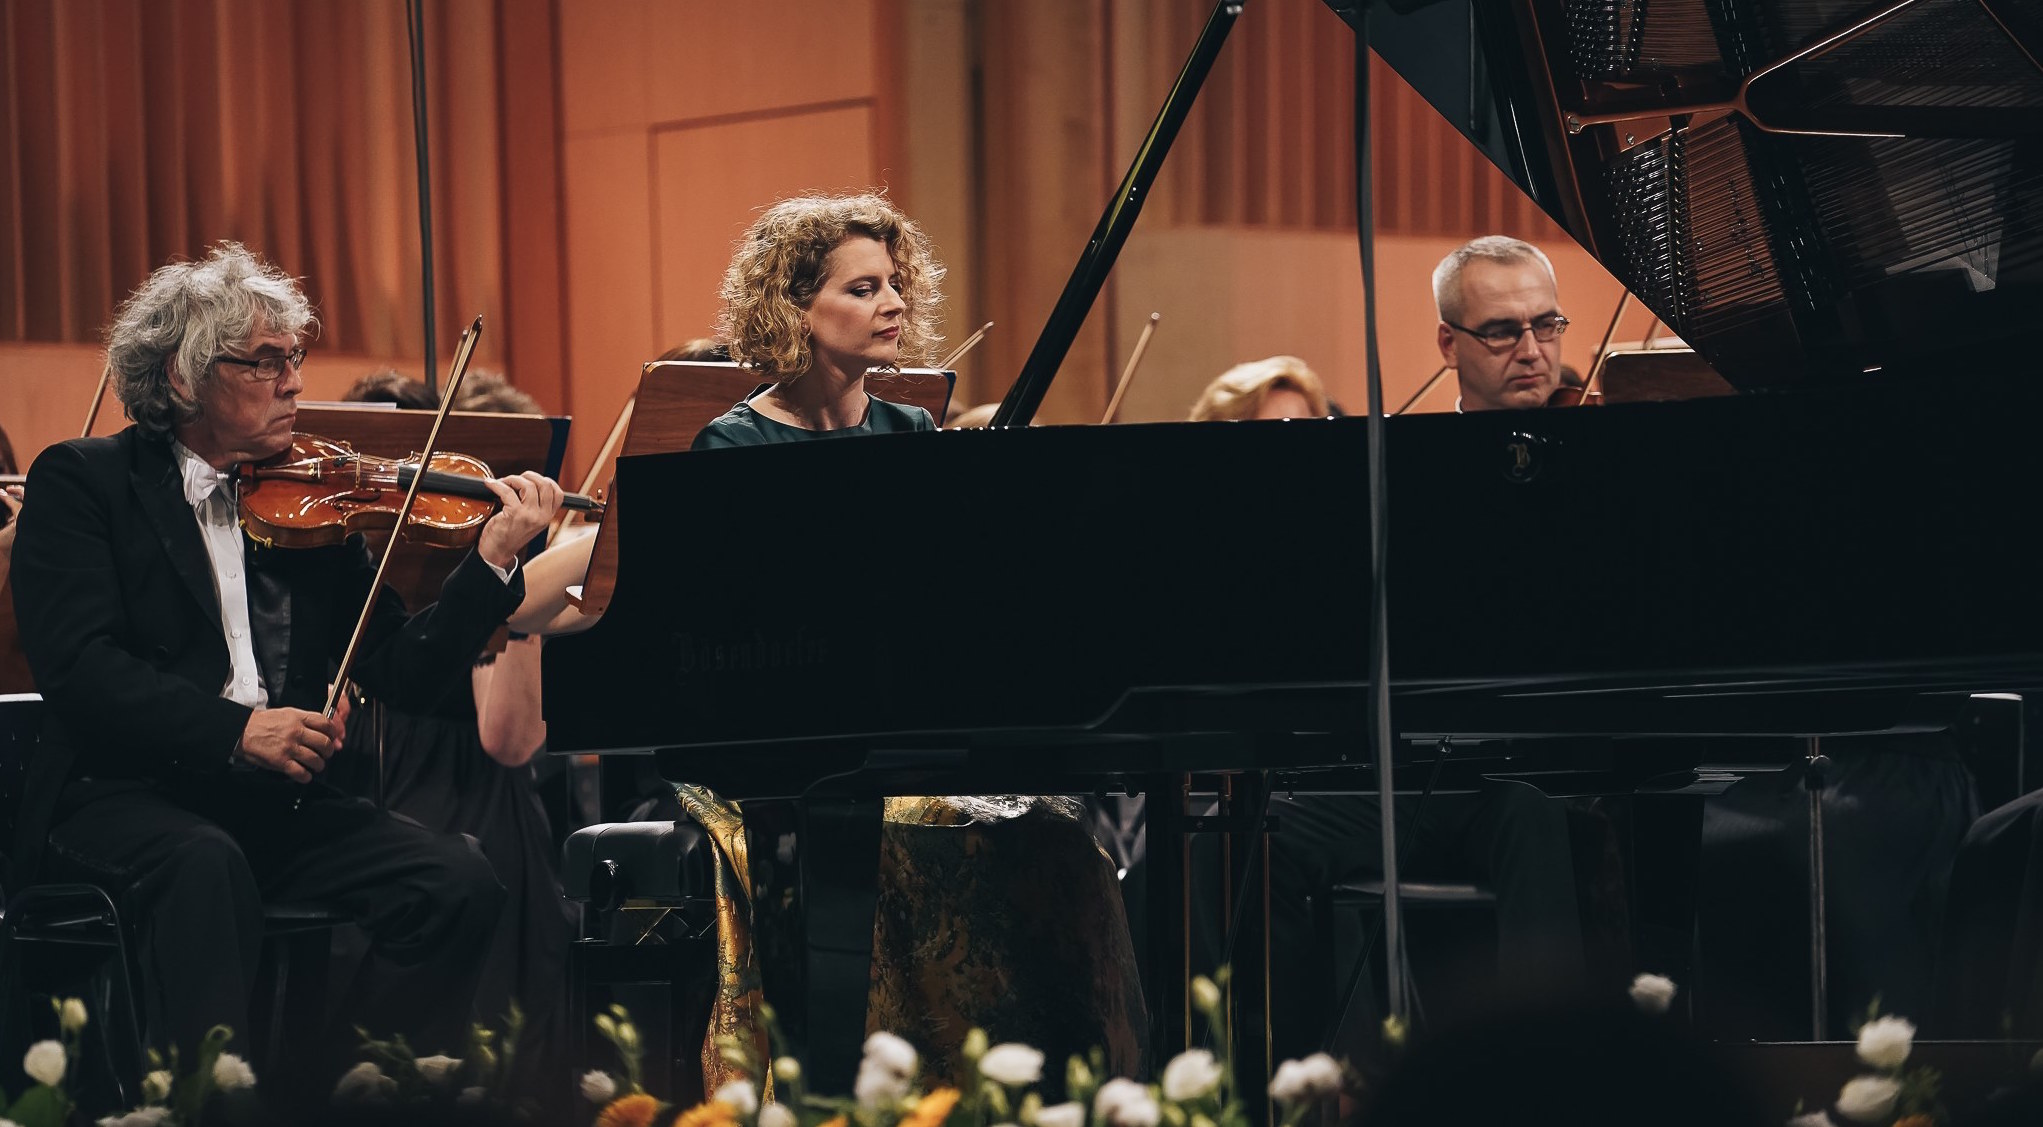 piano pianist Silocea music classical performance culture stage live Romania orchestra Bosendorfer